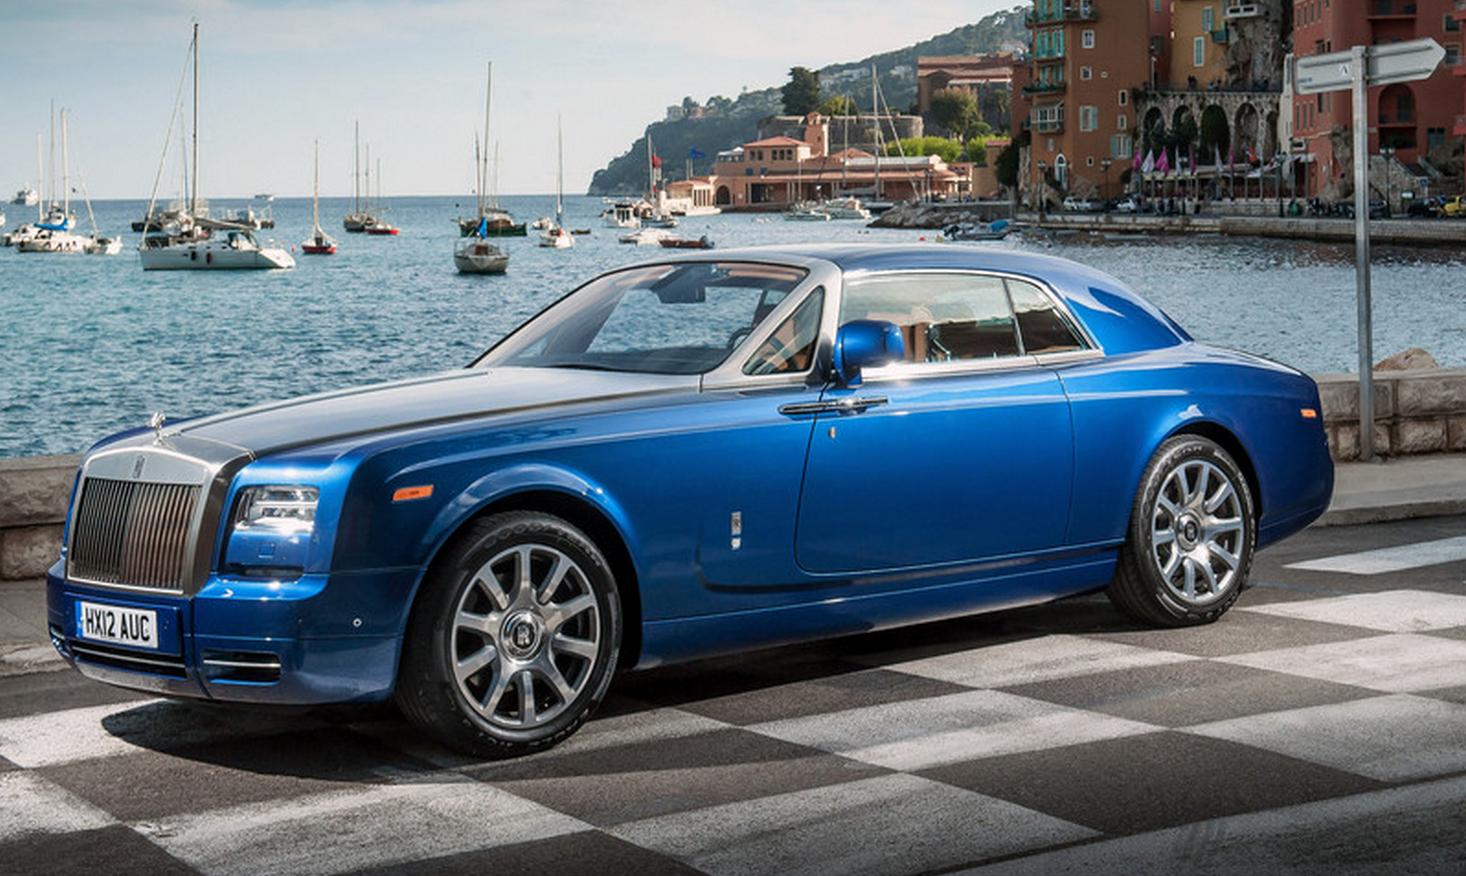 Bentley Gt Vs Rolls Royce Phantom Exotic Car List